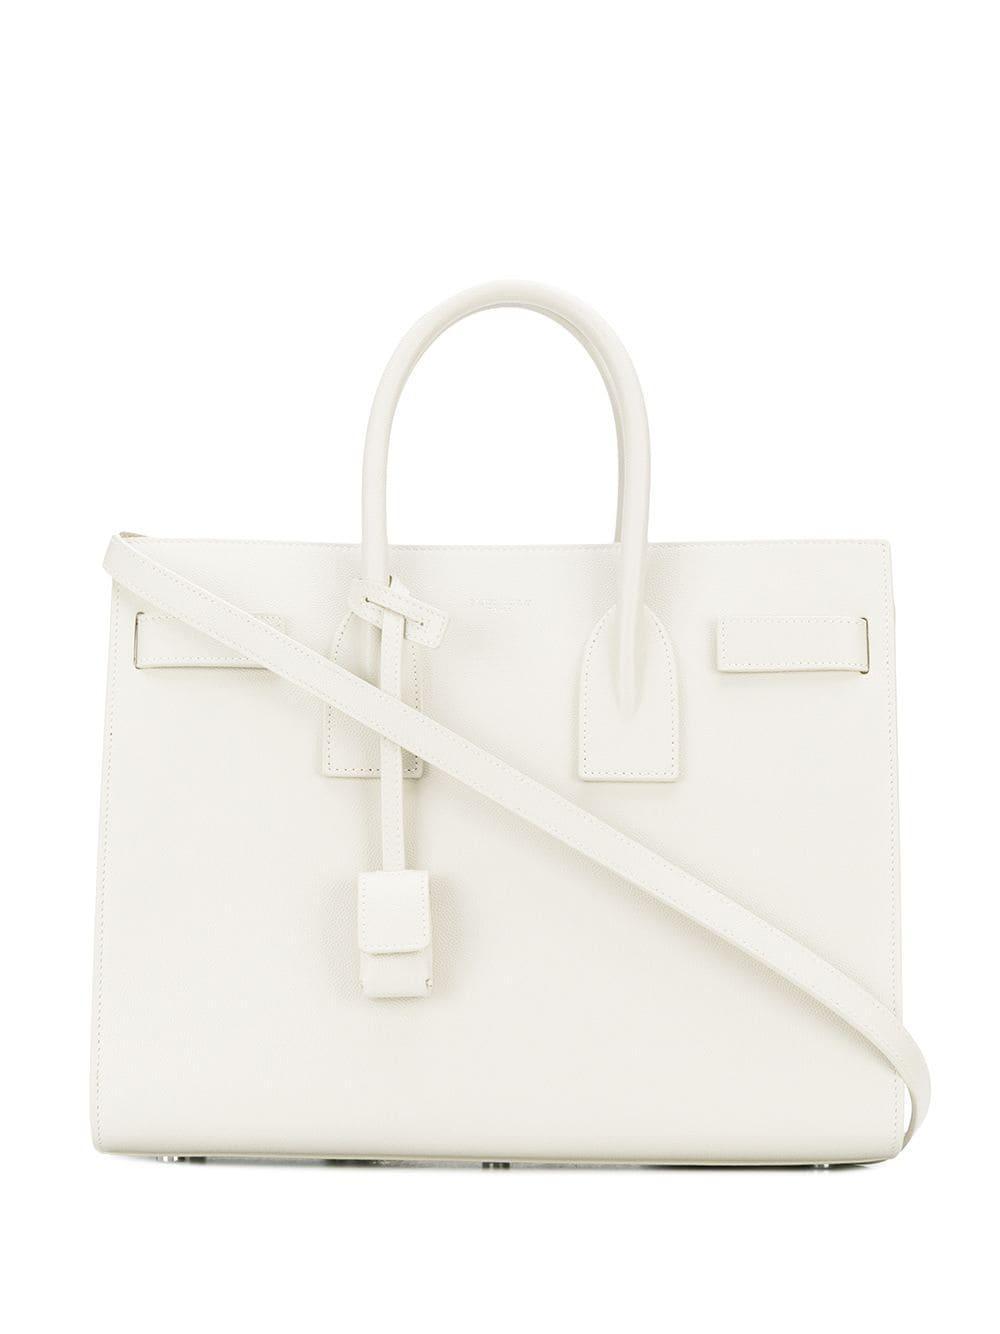 Sac De Jour Small Double Carry Handbag